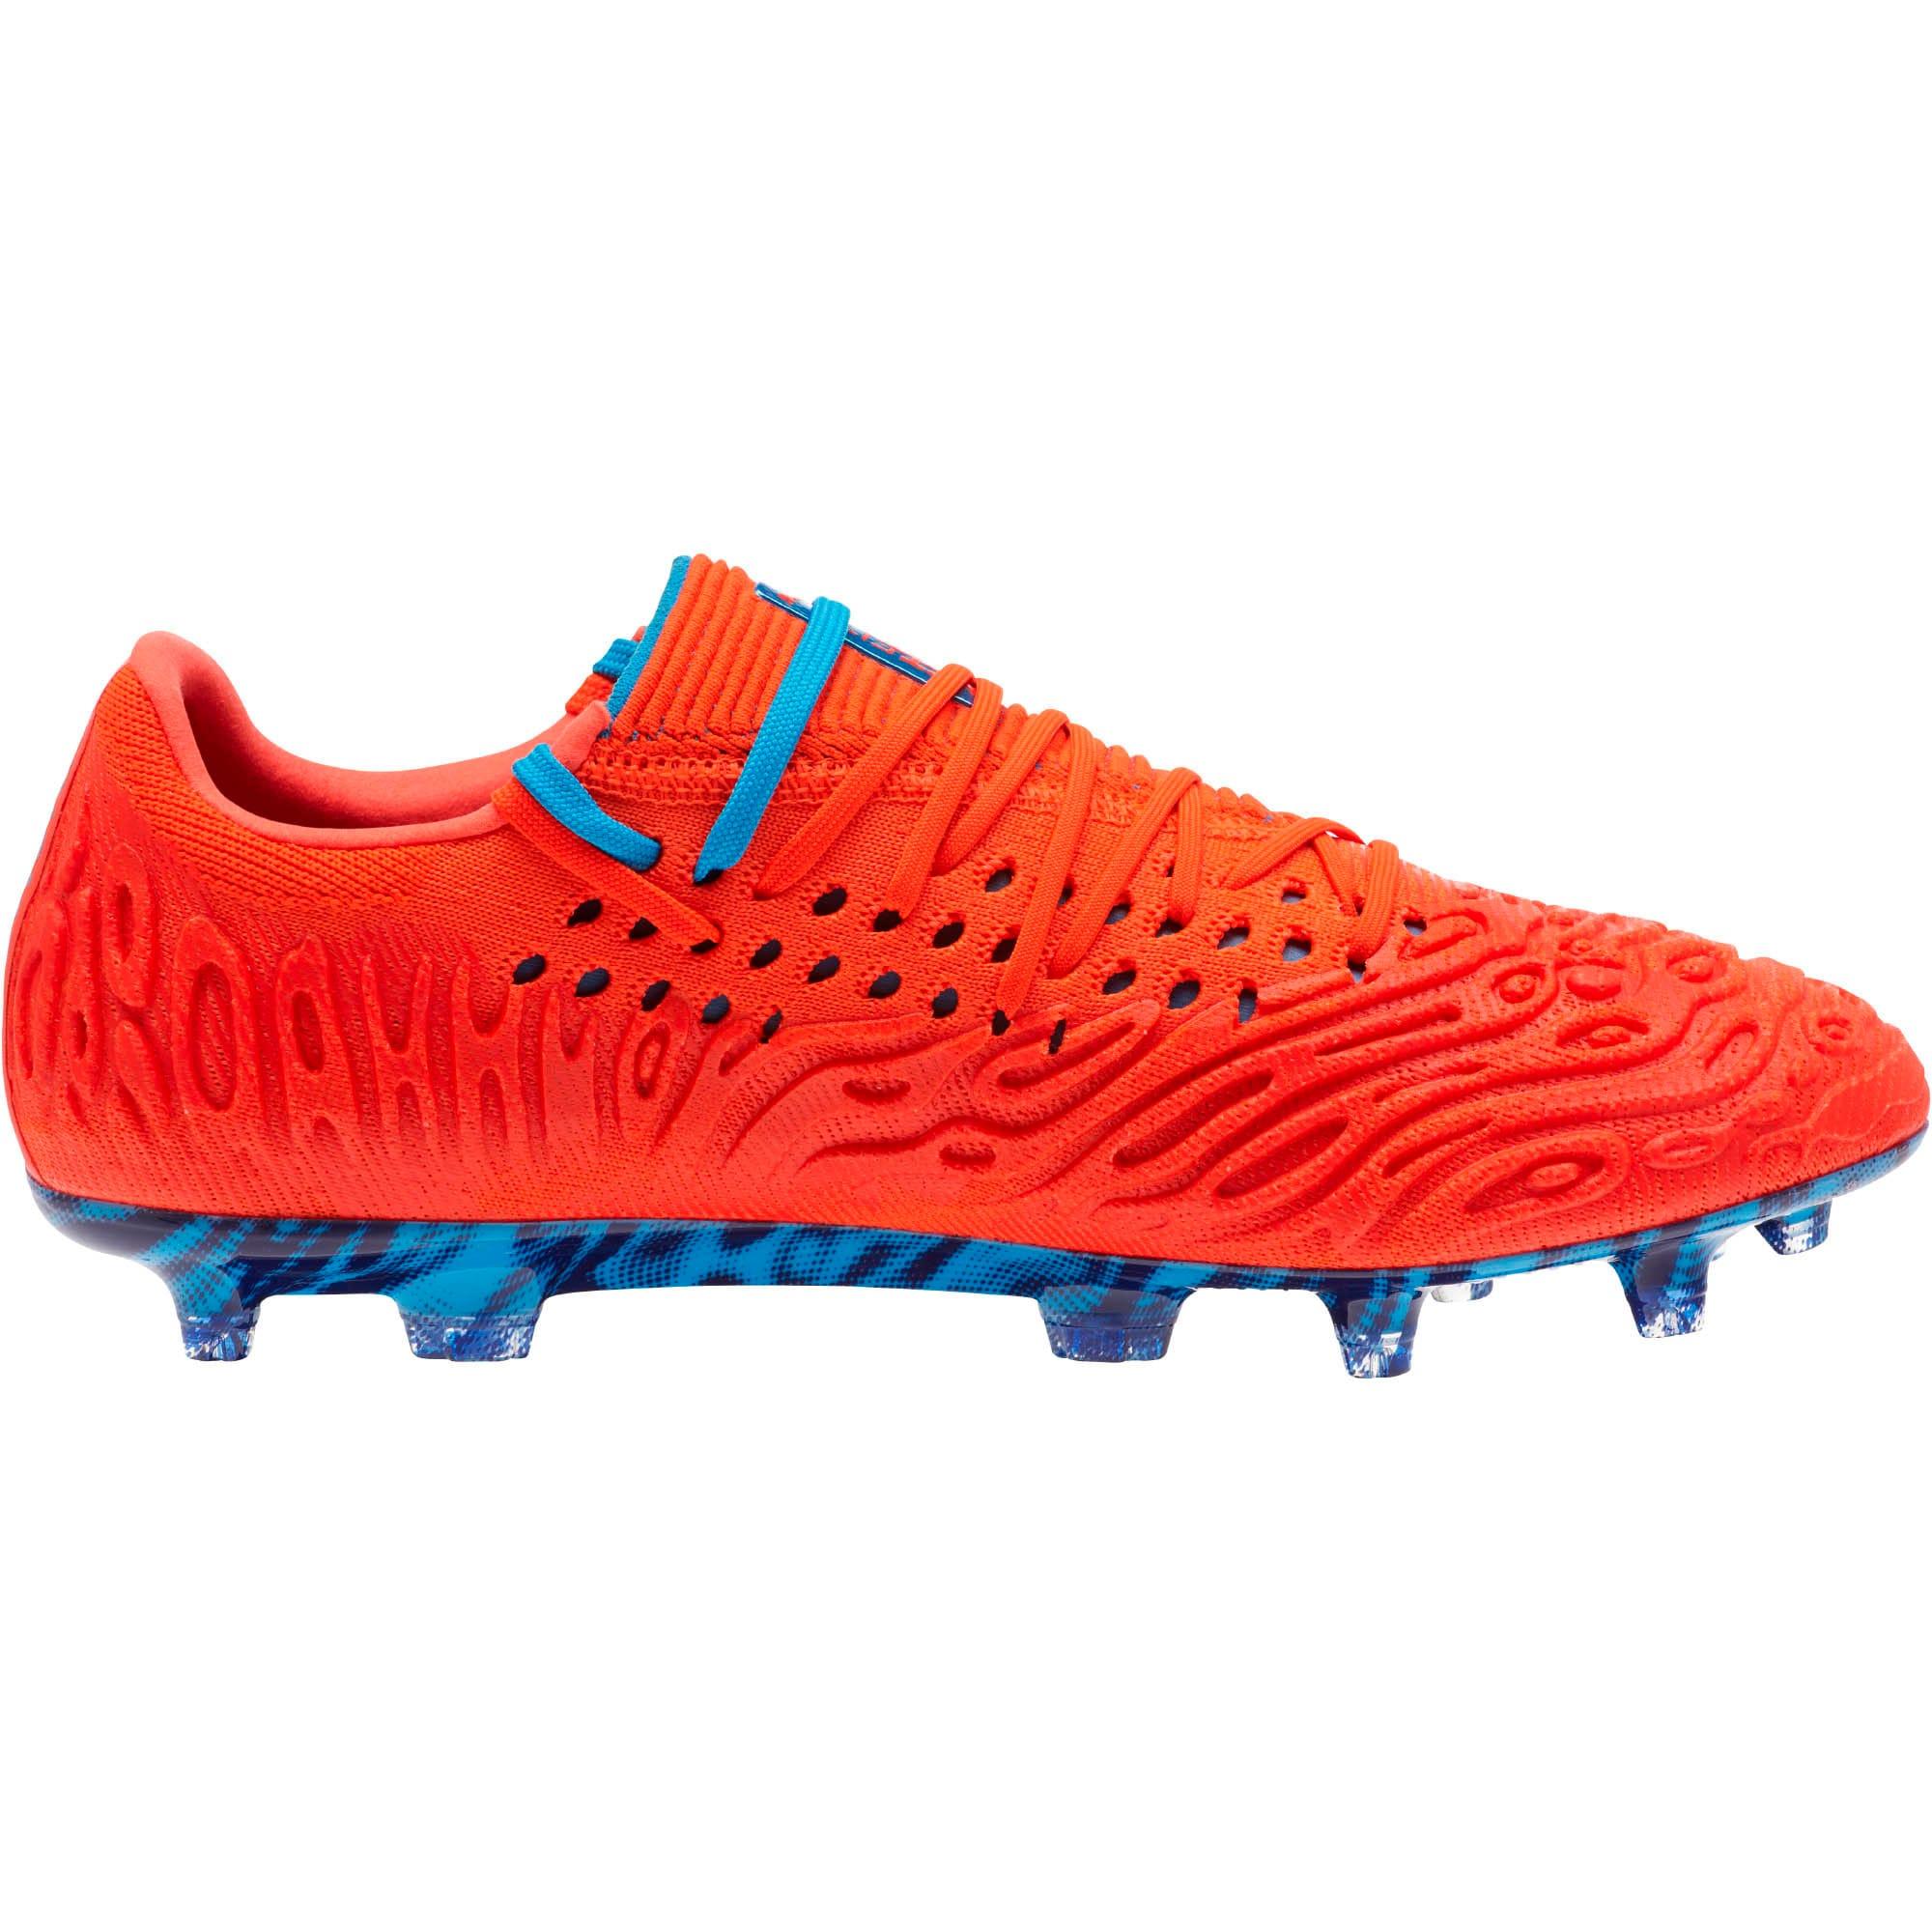 Thumbnail 3 of FUTURE 19.1 NETFIT Lo FG/AG Men's Soccer Cleats, Red Blast-Bleu Azur, medium